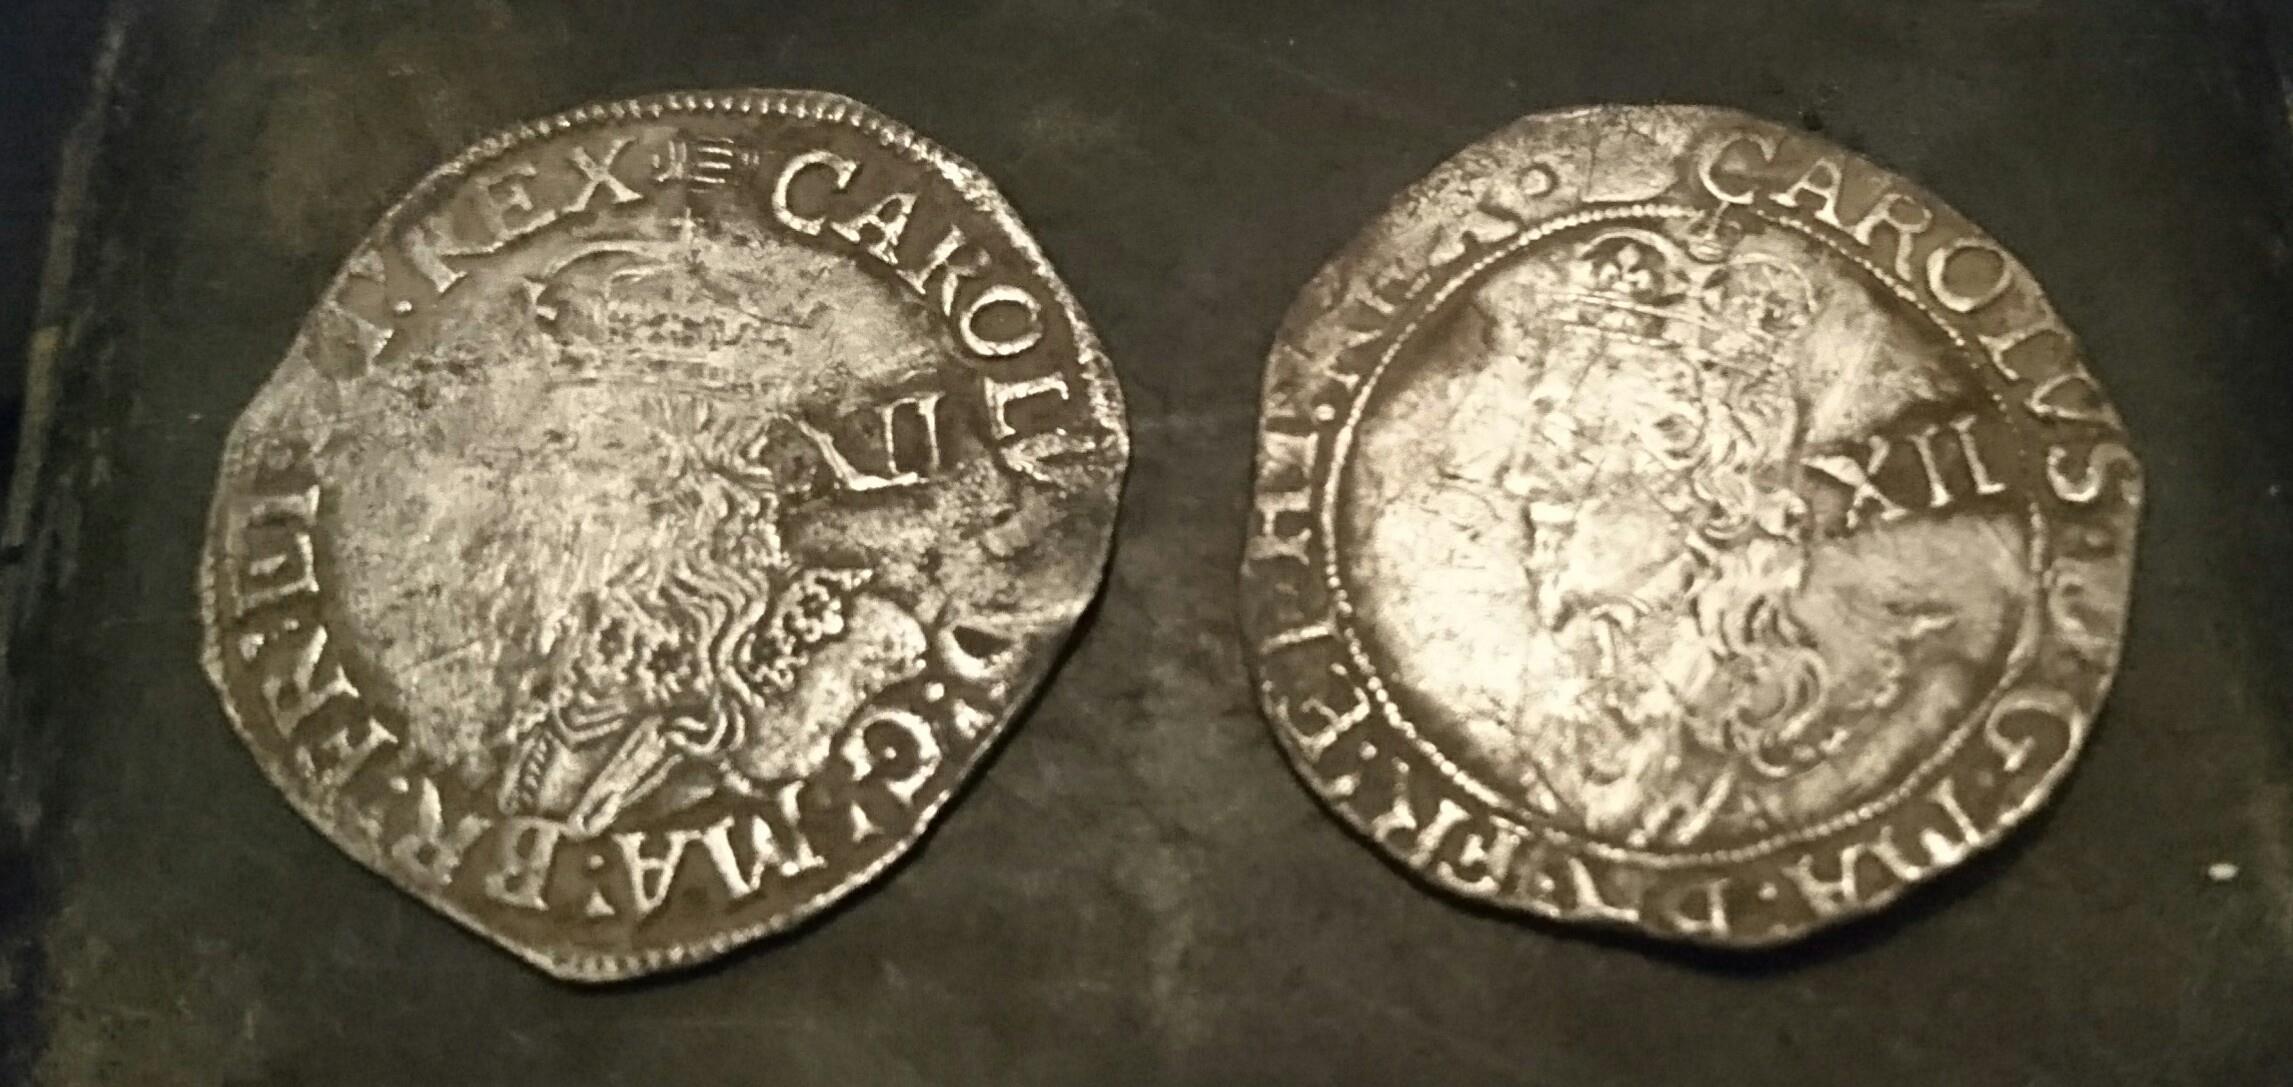 Charles 1st Shillings